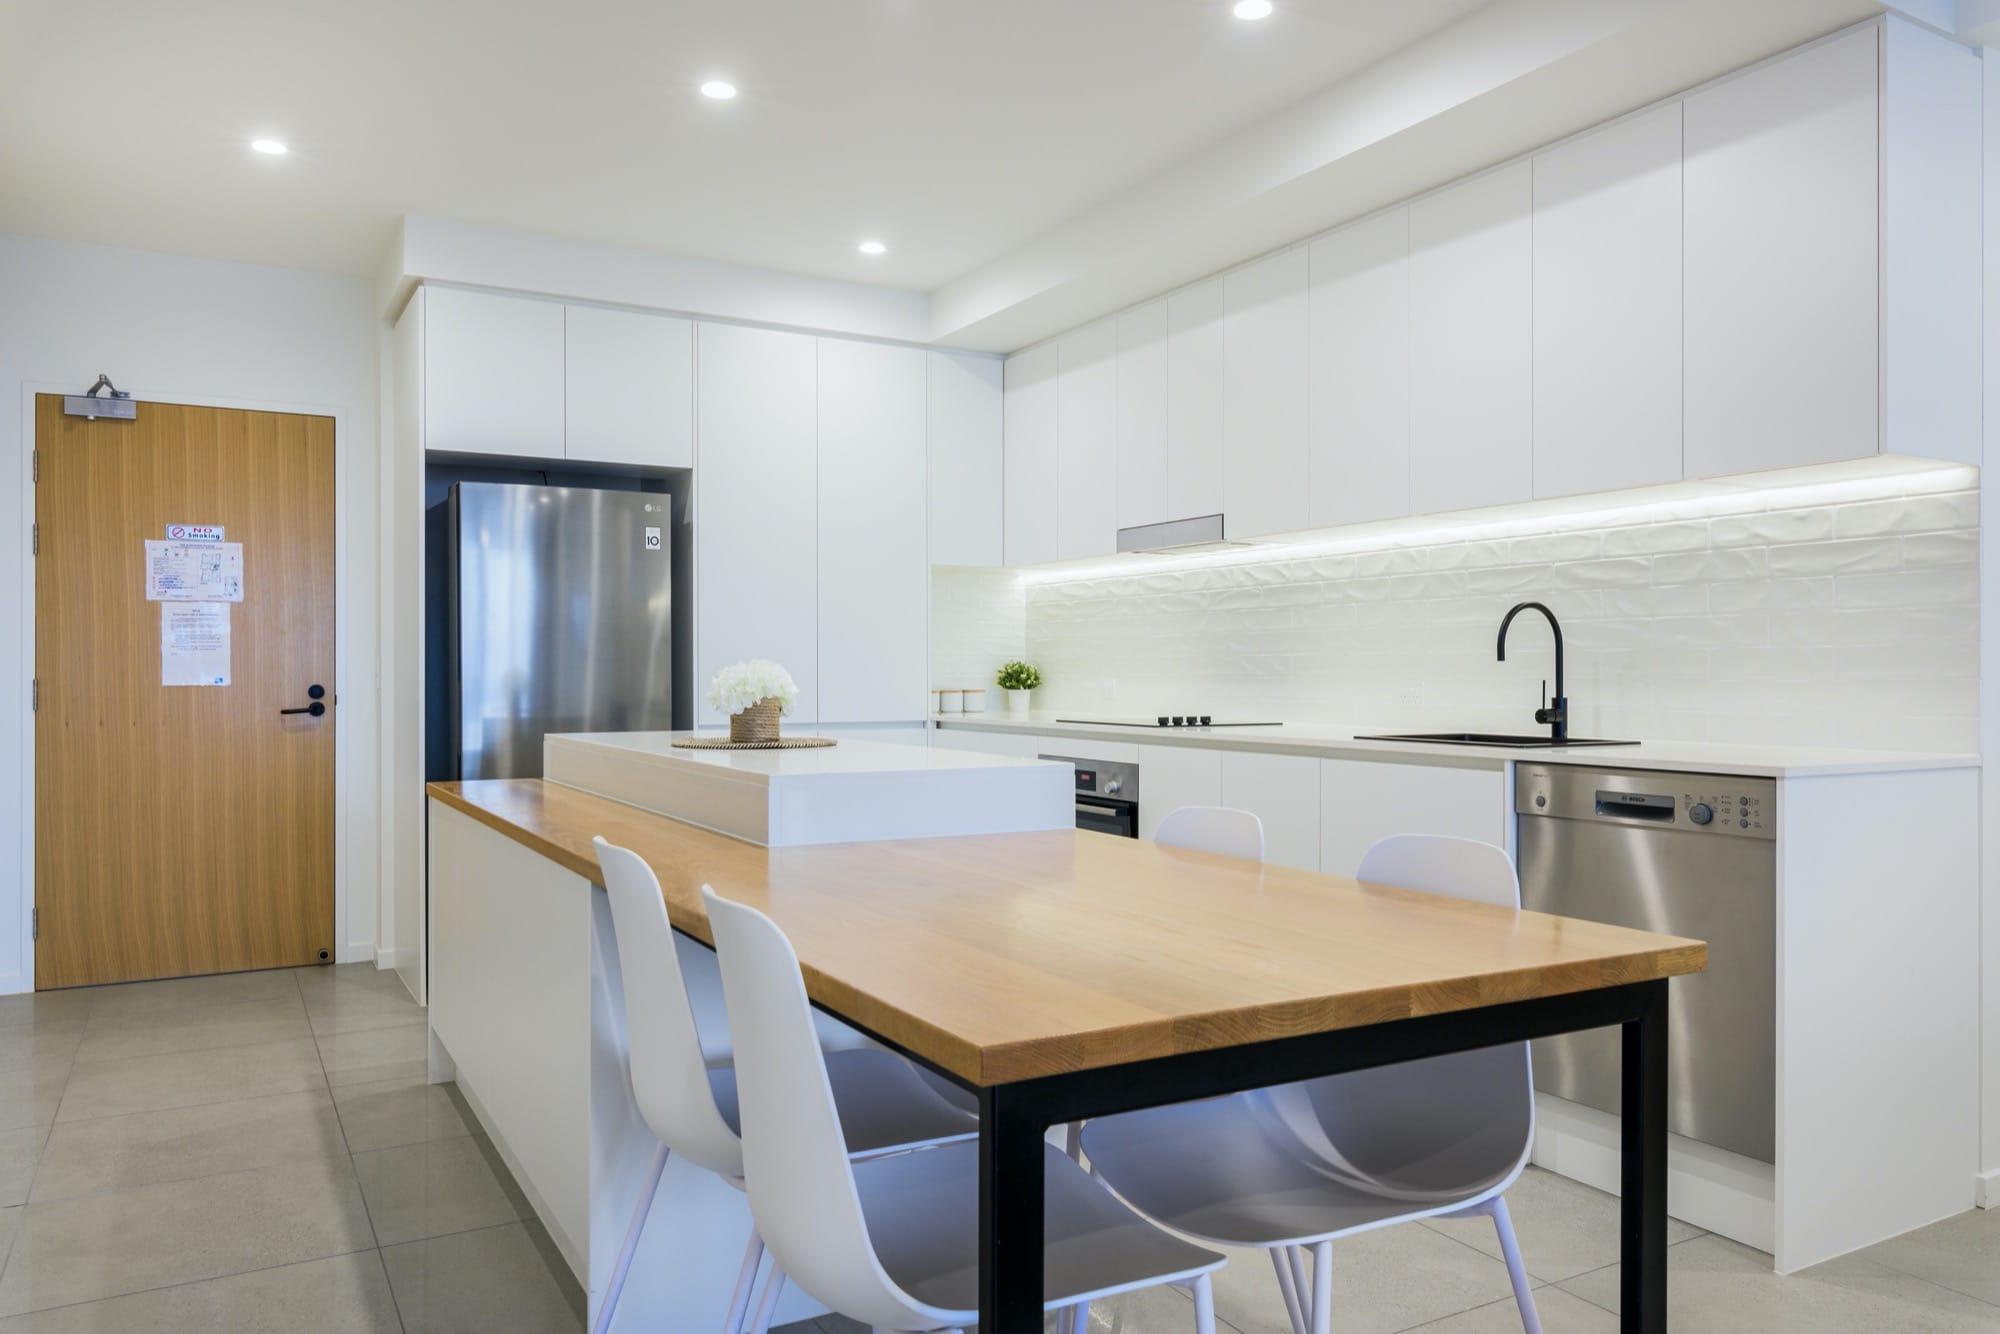 unit-501-kitchen-1